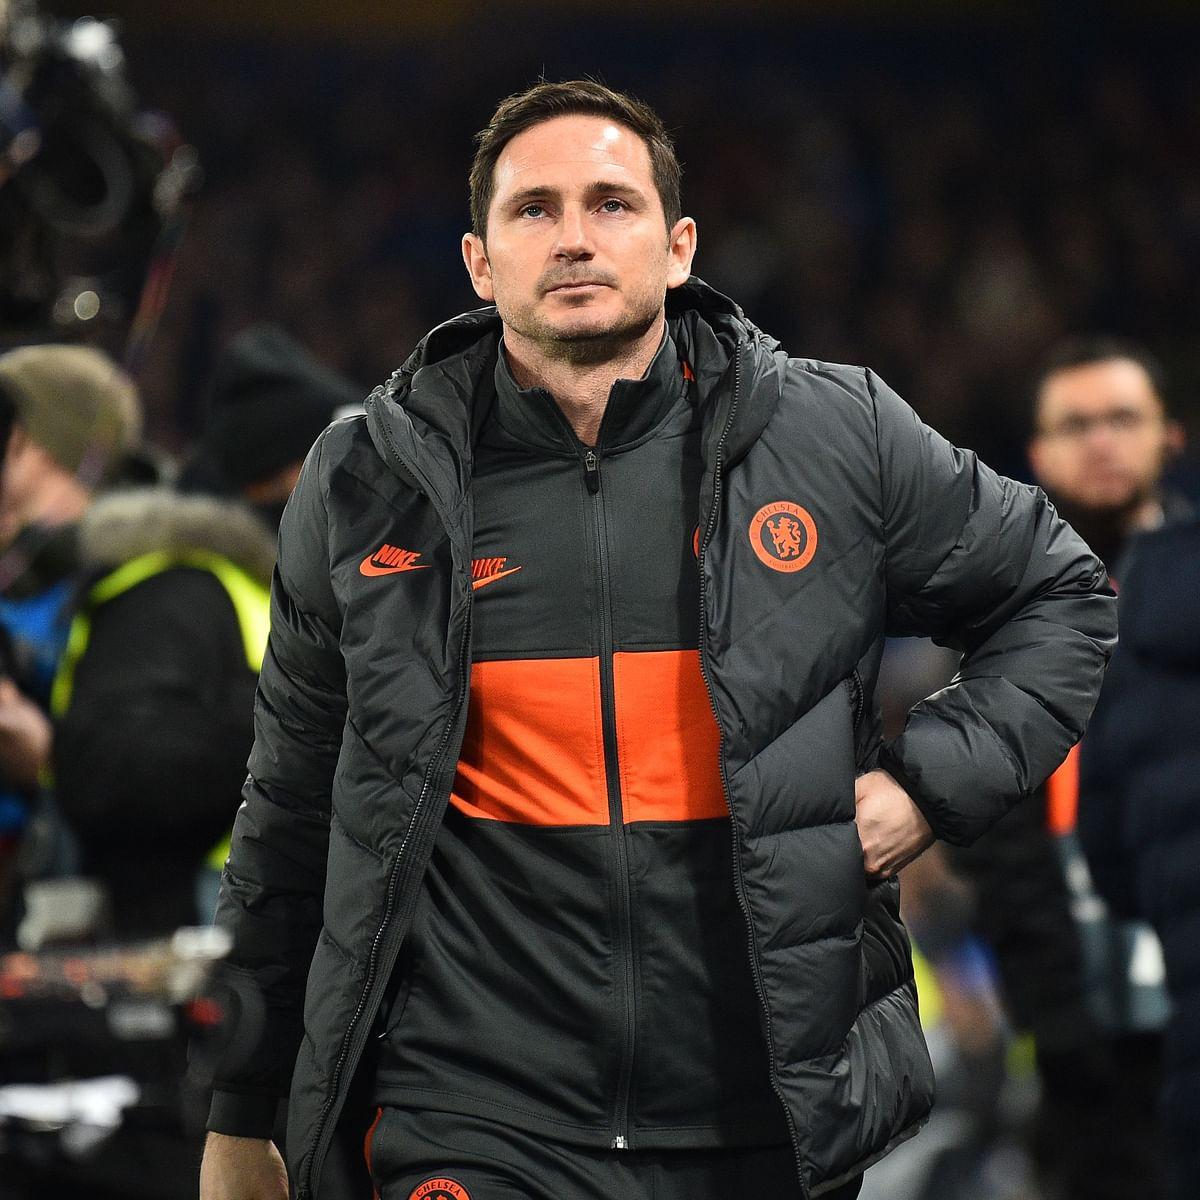 Frank Lampard justifies his 'arrogant' jibe, says Liverpool staff broke touchline code